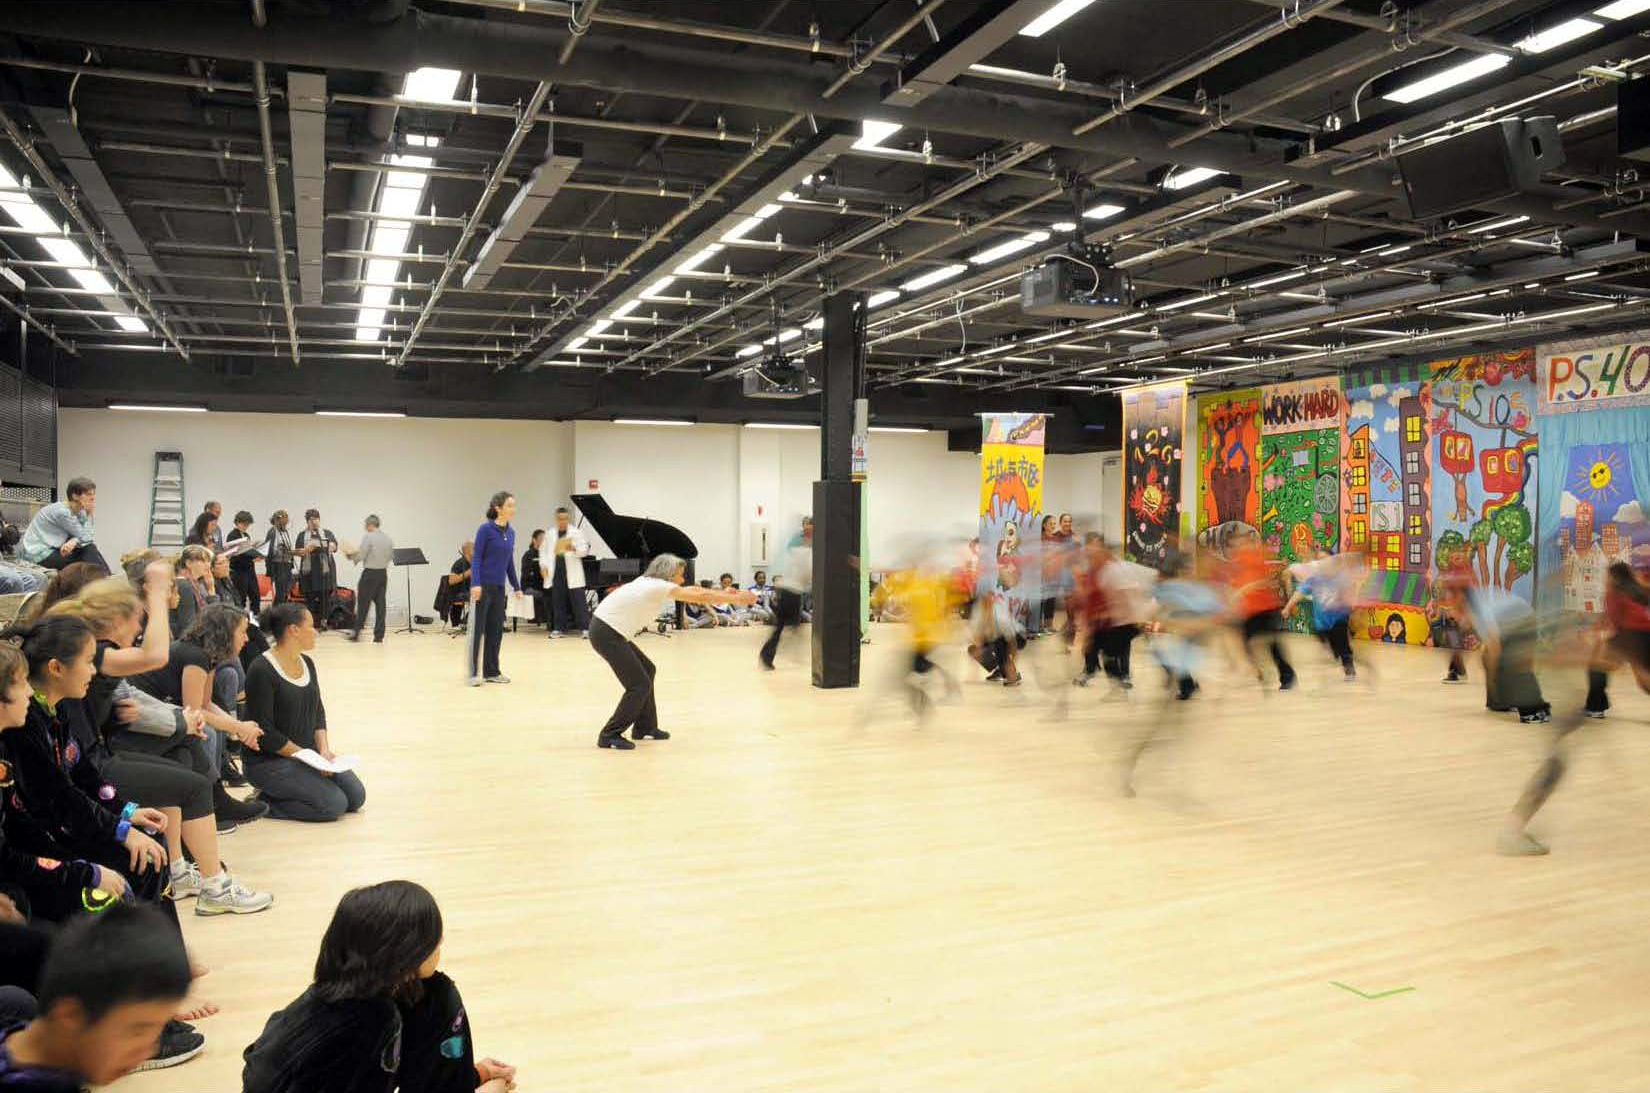 122_National Dance Institute.jpg